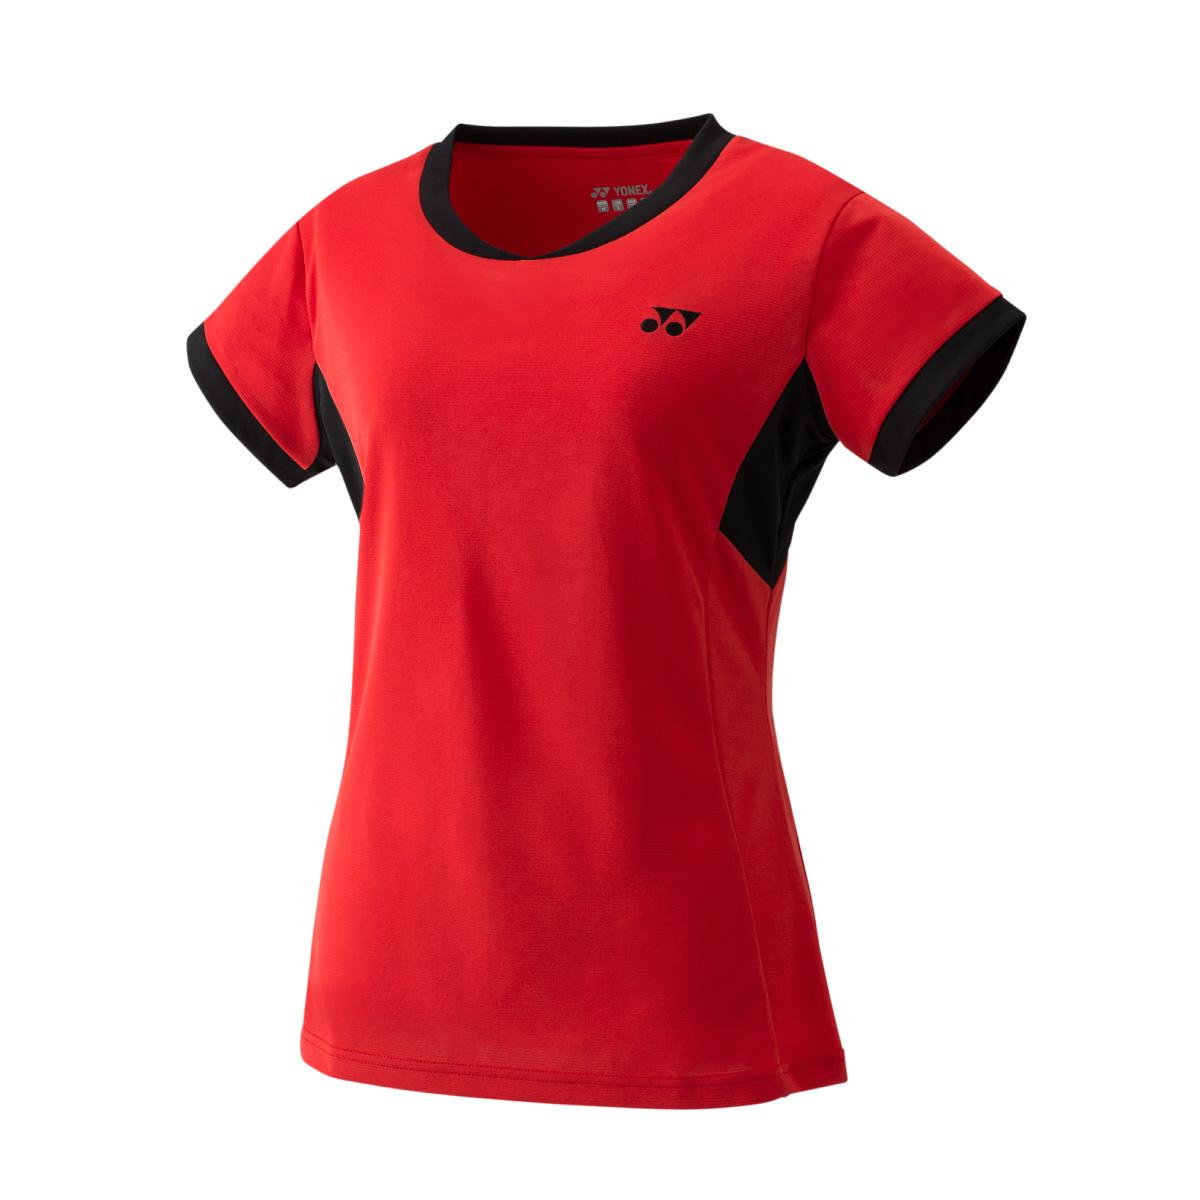 YONEX - Women Crew Neck Shirt #YW0010Detailbild - 0